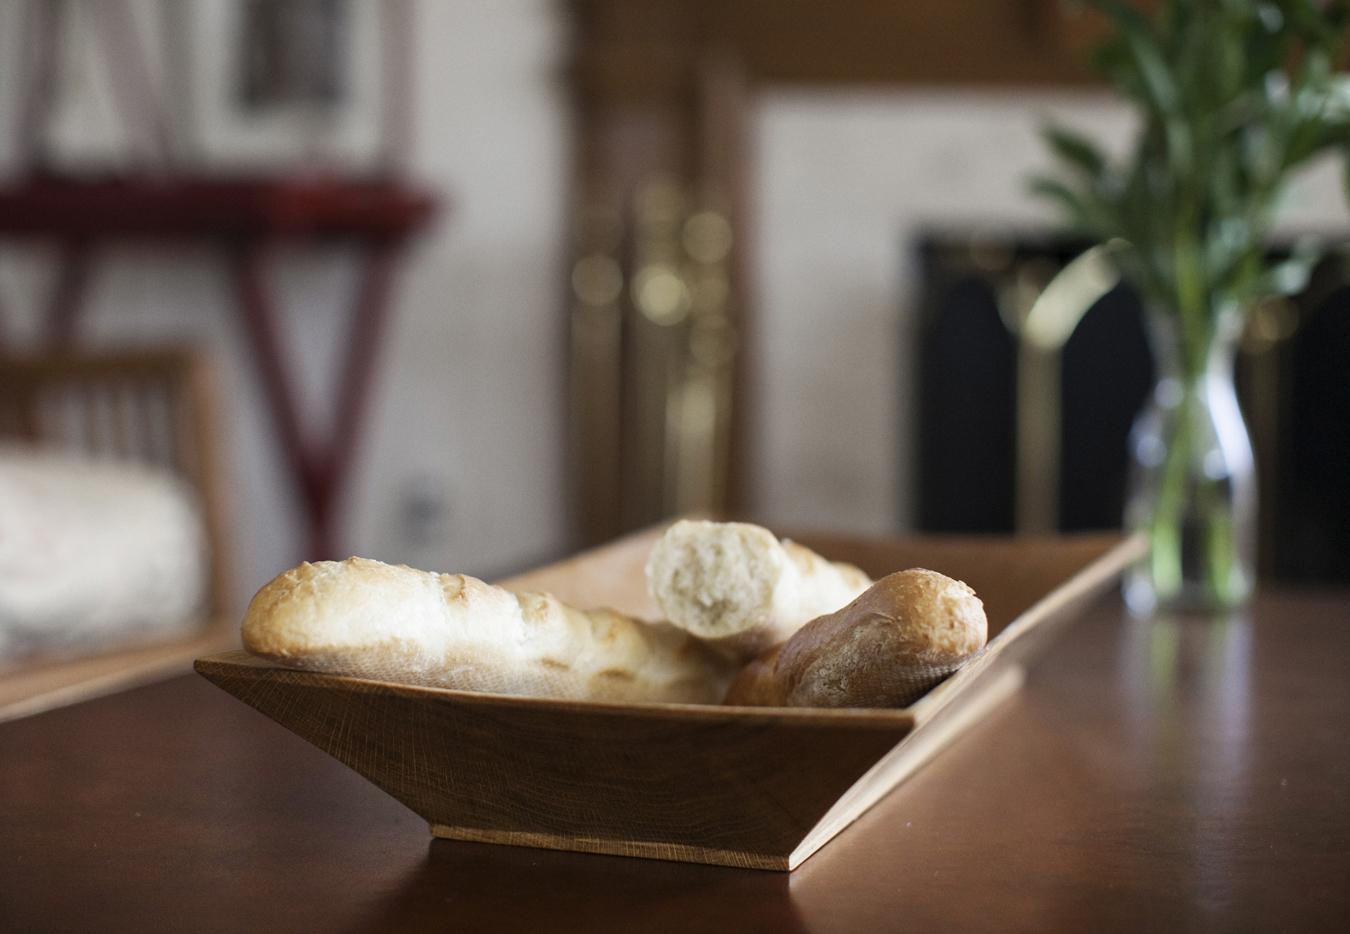 R_Rect Bowl w Bread_3573.jpg